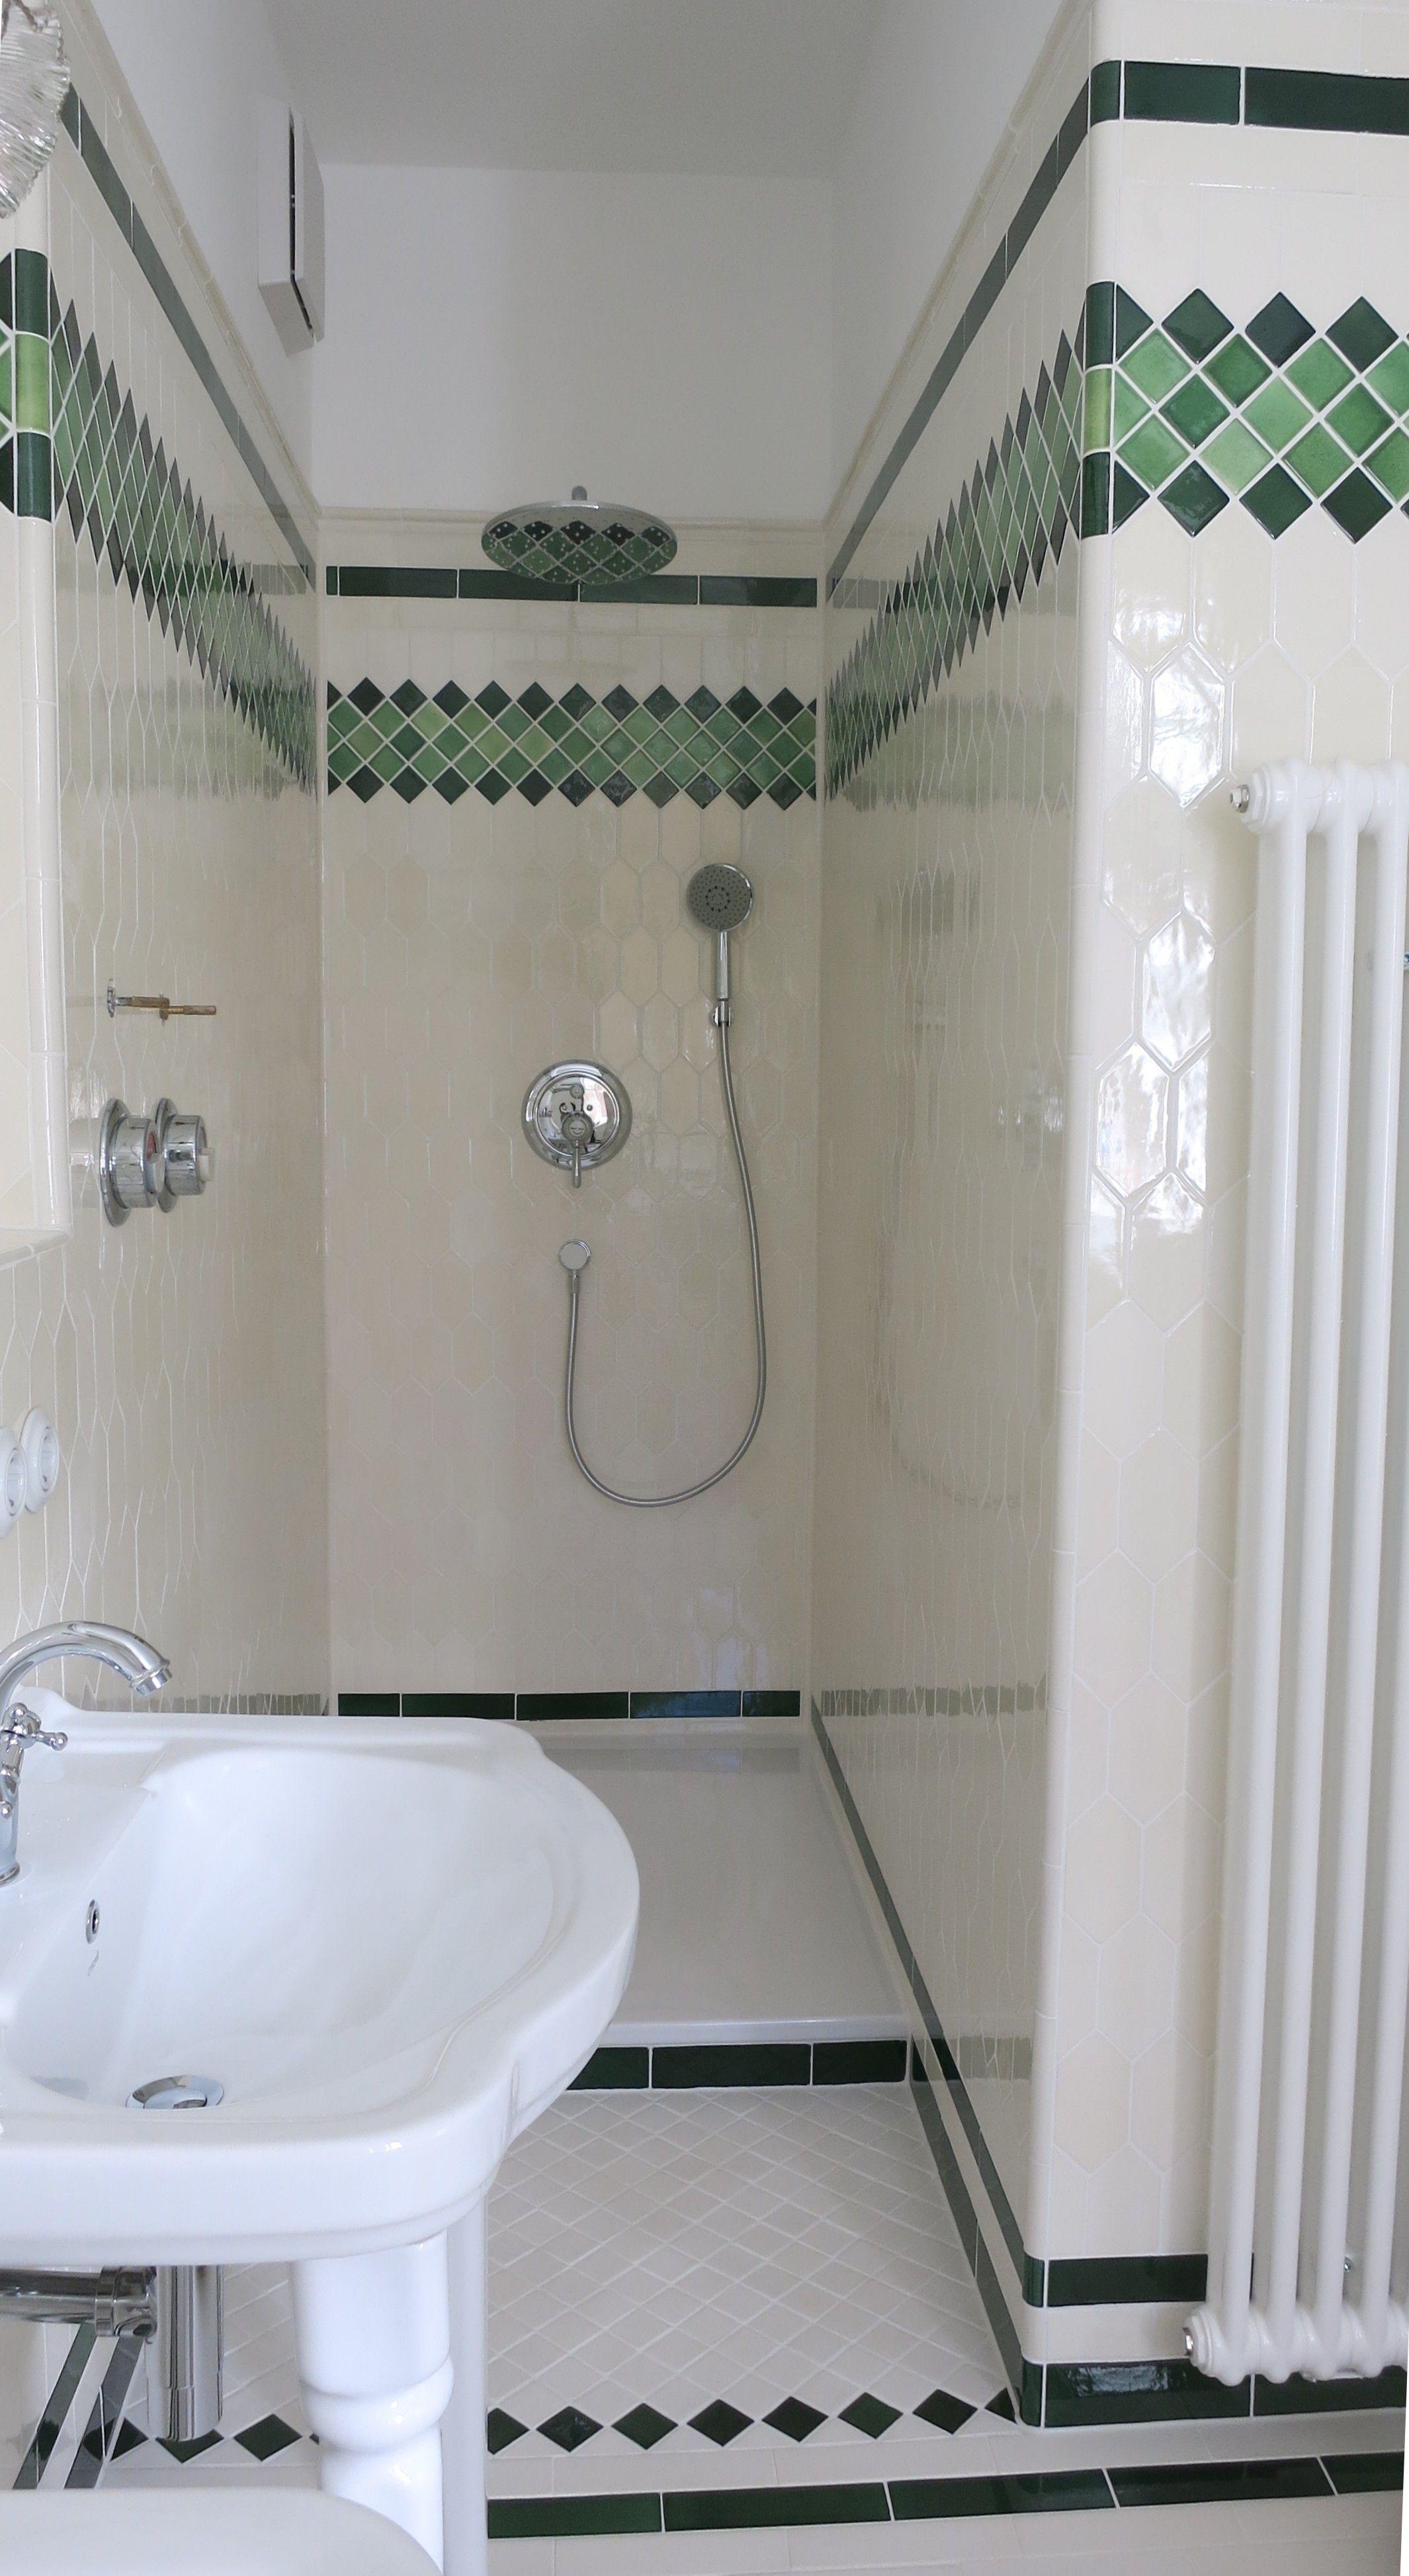 douche salle de bain art deco style